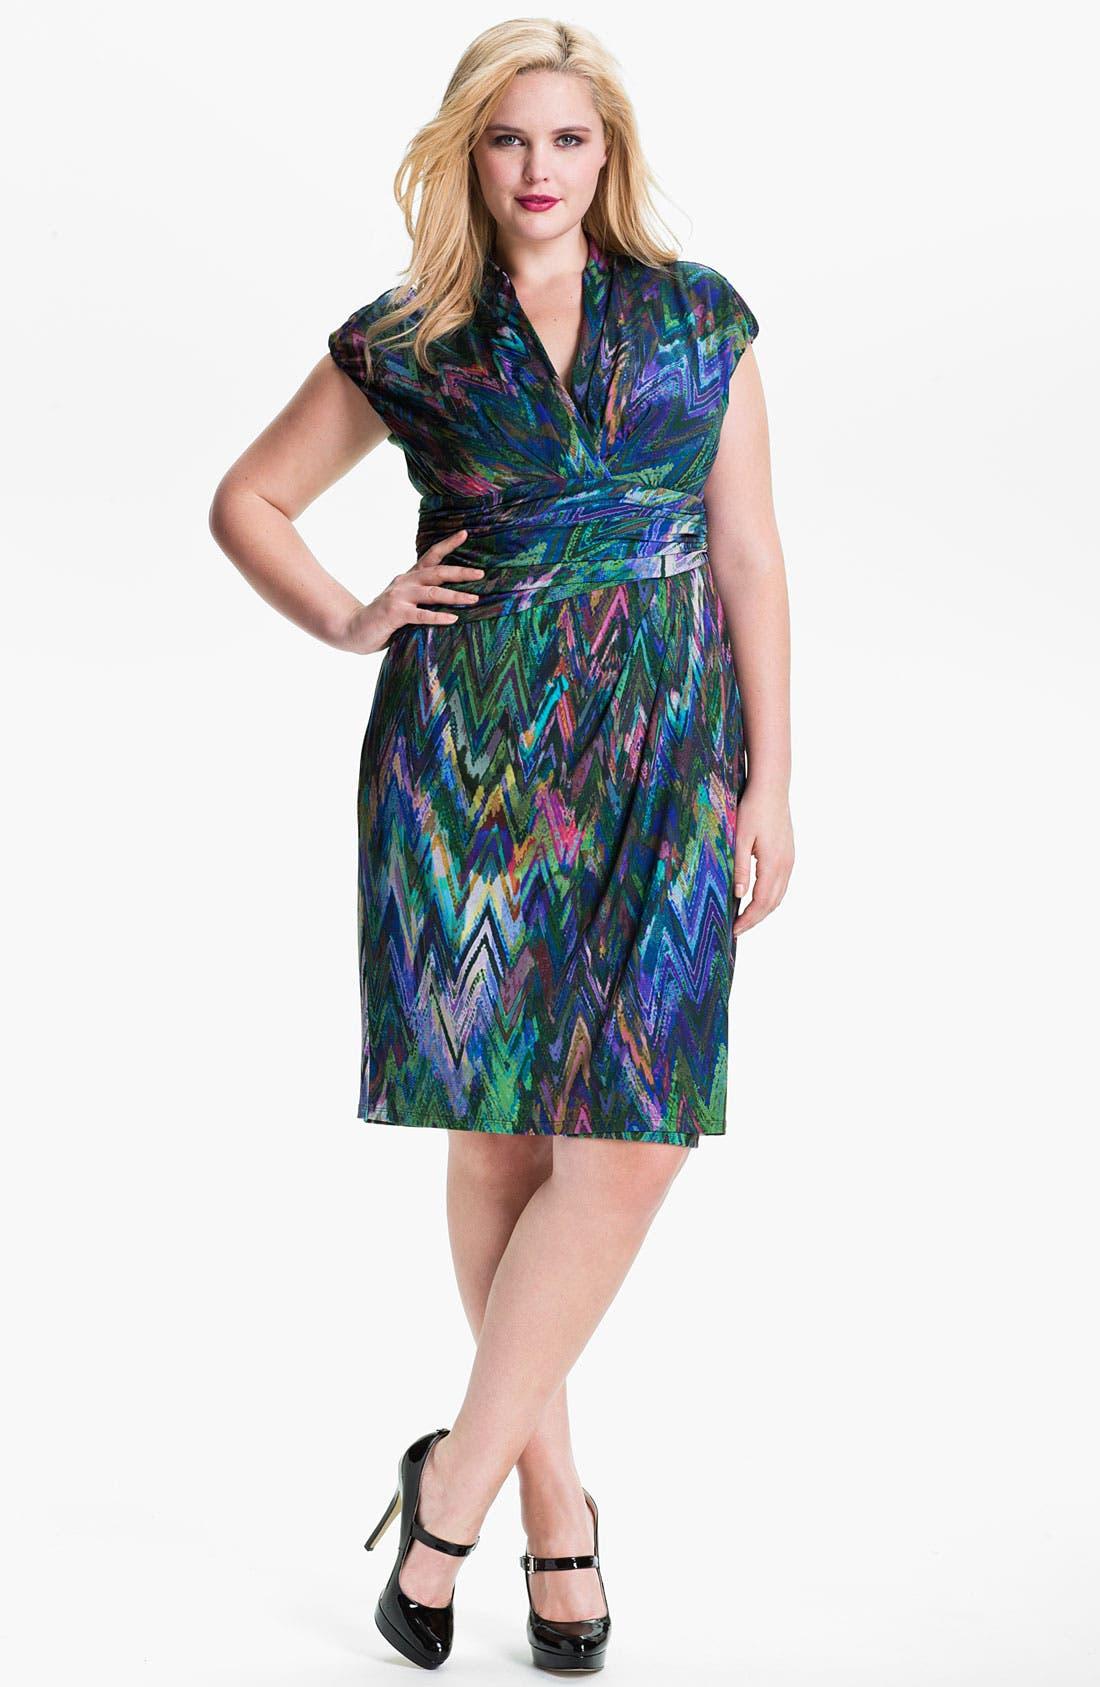 Alternate Image 1 Selected - Suzi Chin for Maggy Boutique Print Surplice Sheath Dress (Plus)